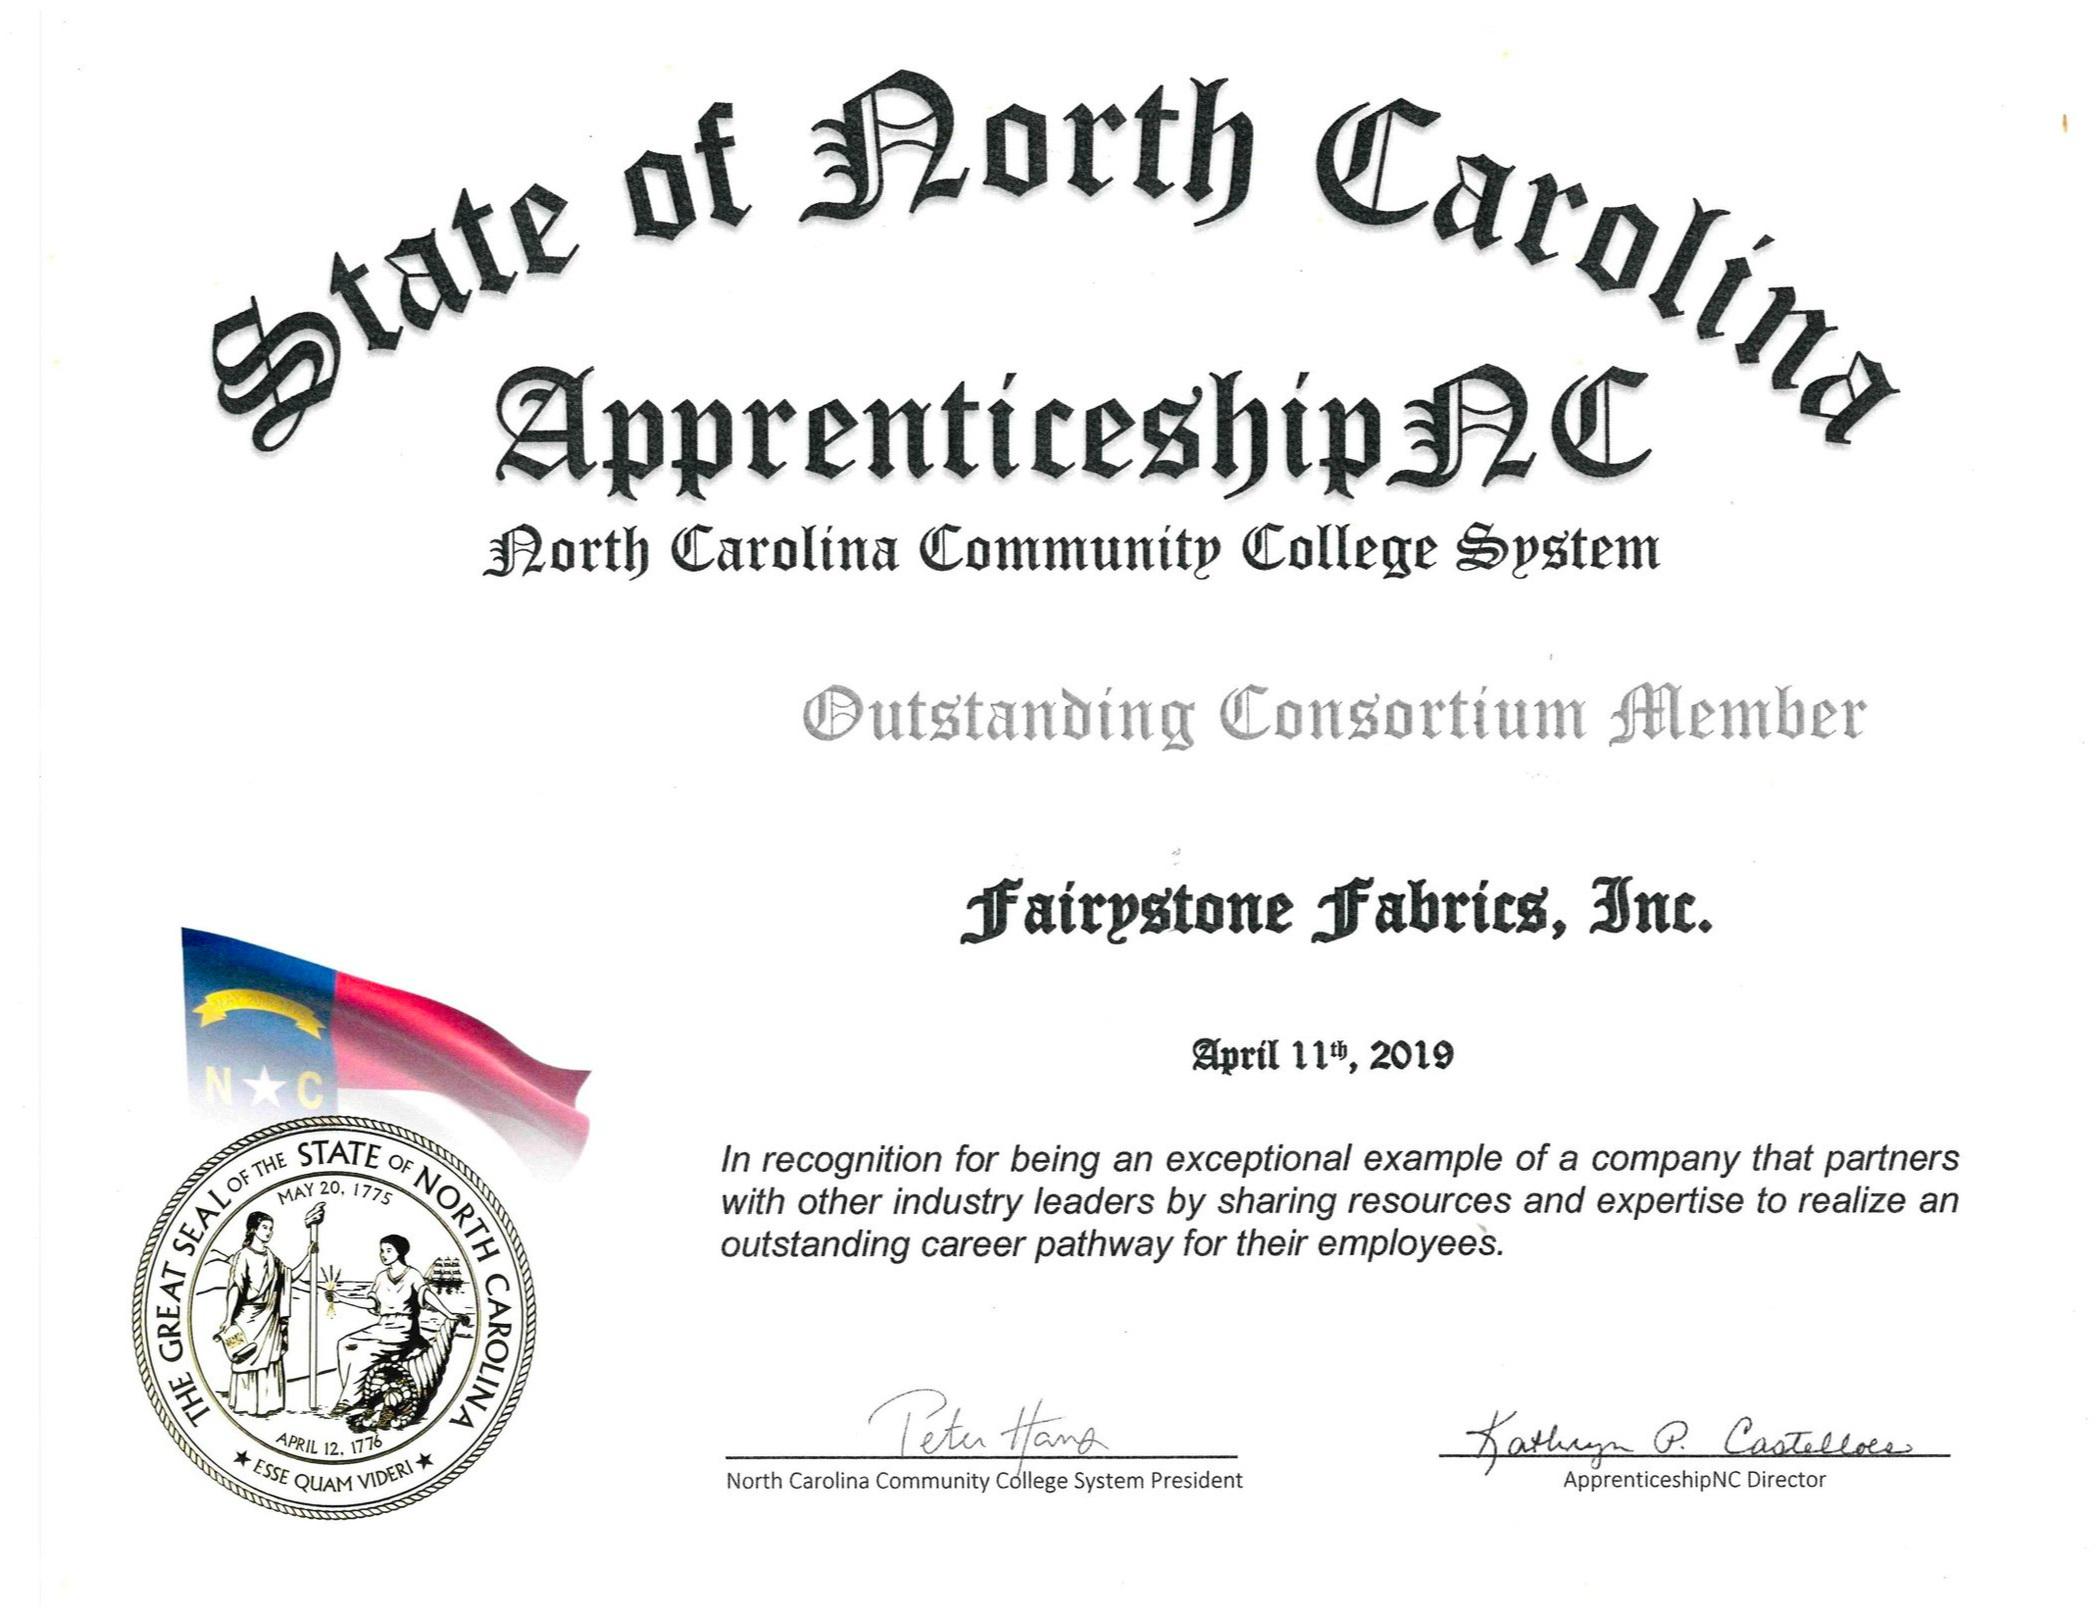 2019+ApprenticeshipNC+Award+Certificate.jpg